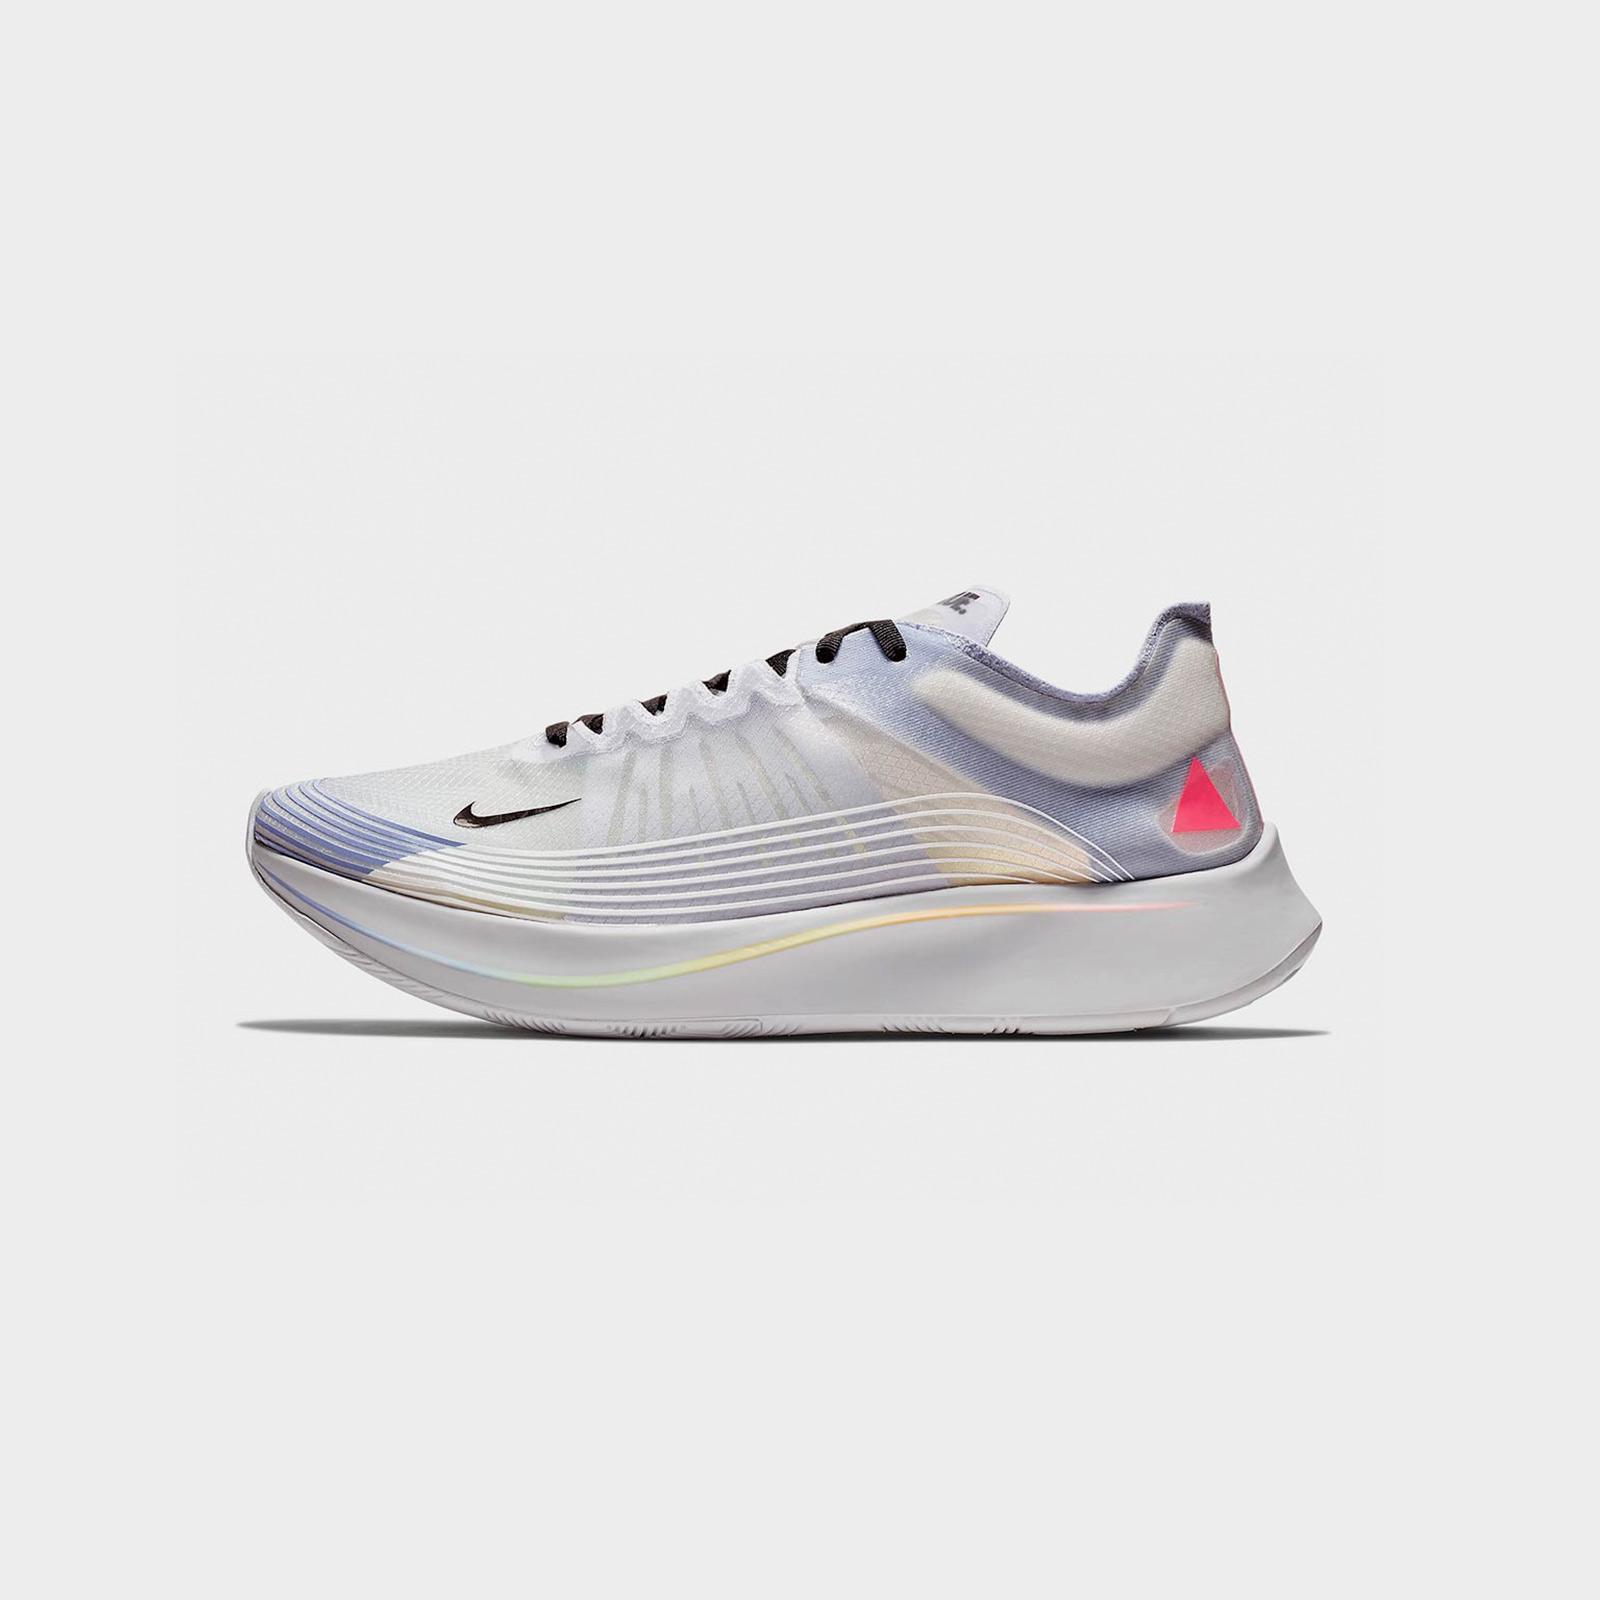 a911c36cc7e6 Nike Zoom Fly Be True - Ar4348-105 - Sneakersnstuff